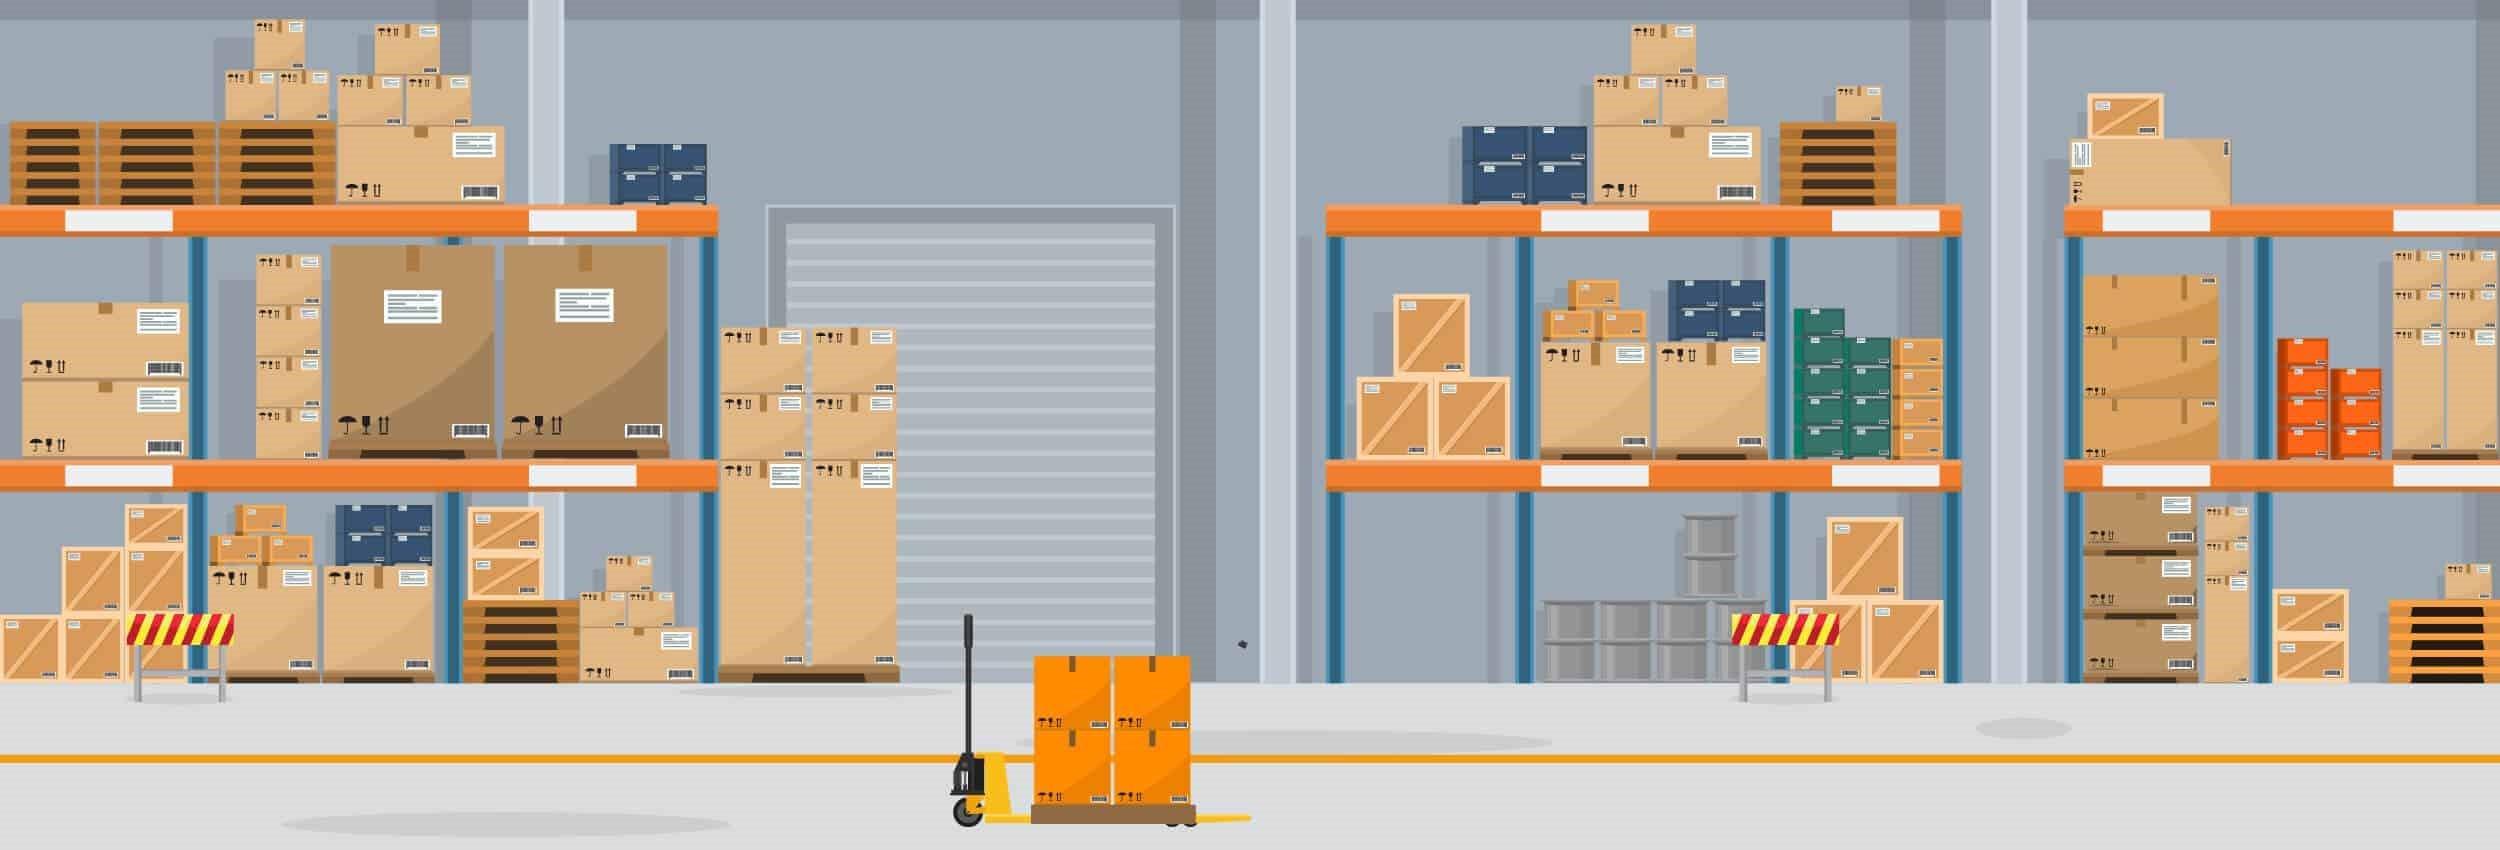 Improving warehouse efficiency